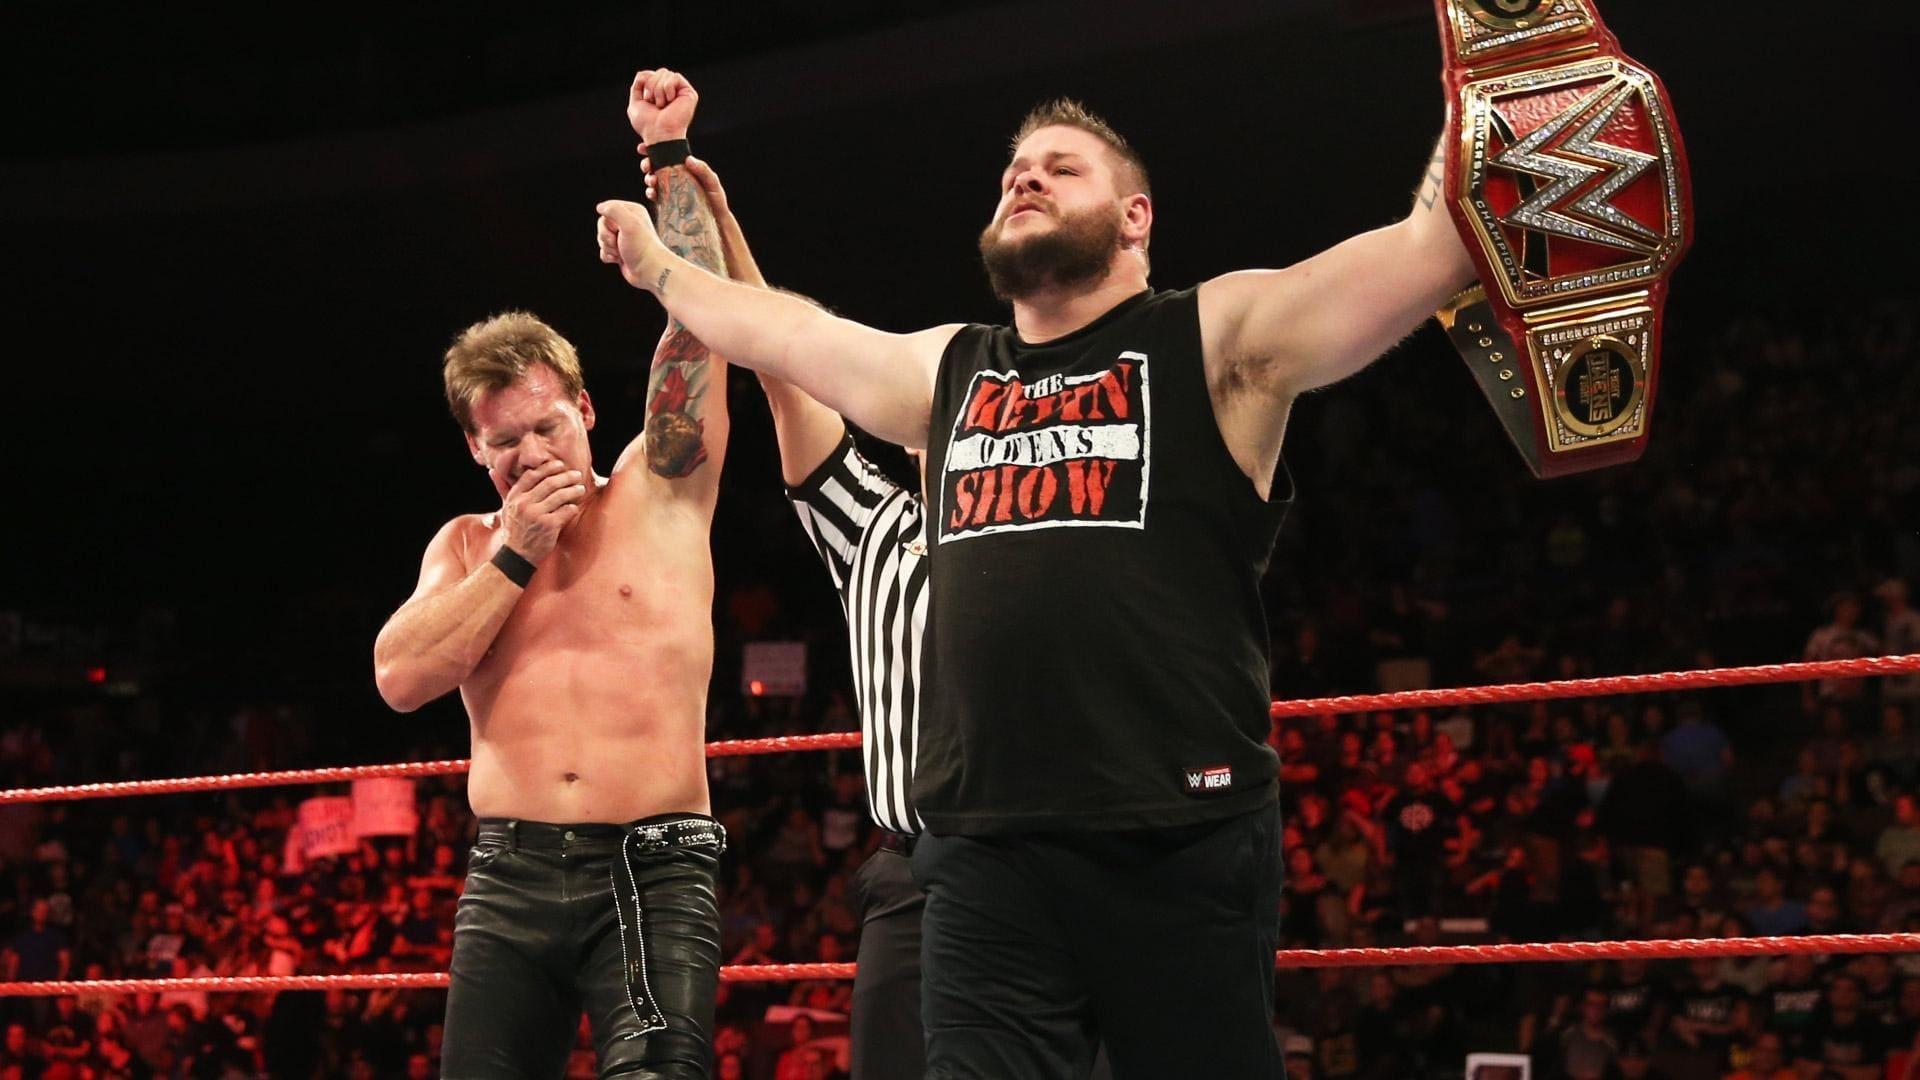 WWE Raw Season 24 :Episode 39  September 26, 2016 (Cincinnati, OH)